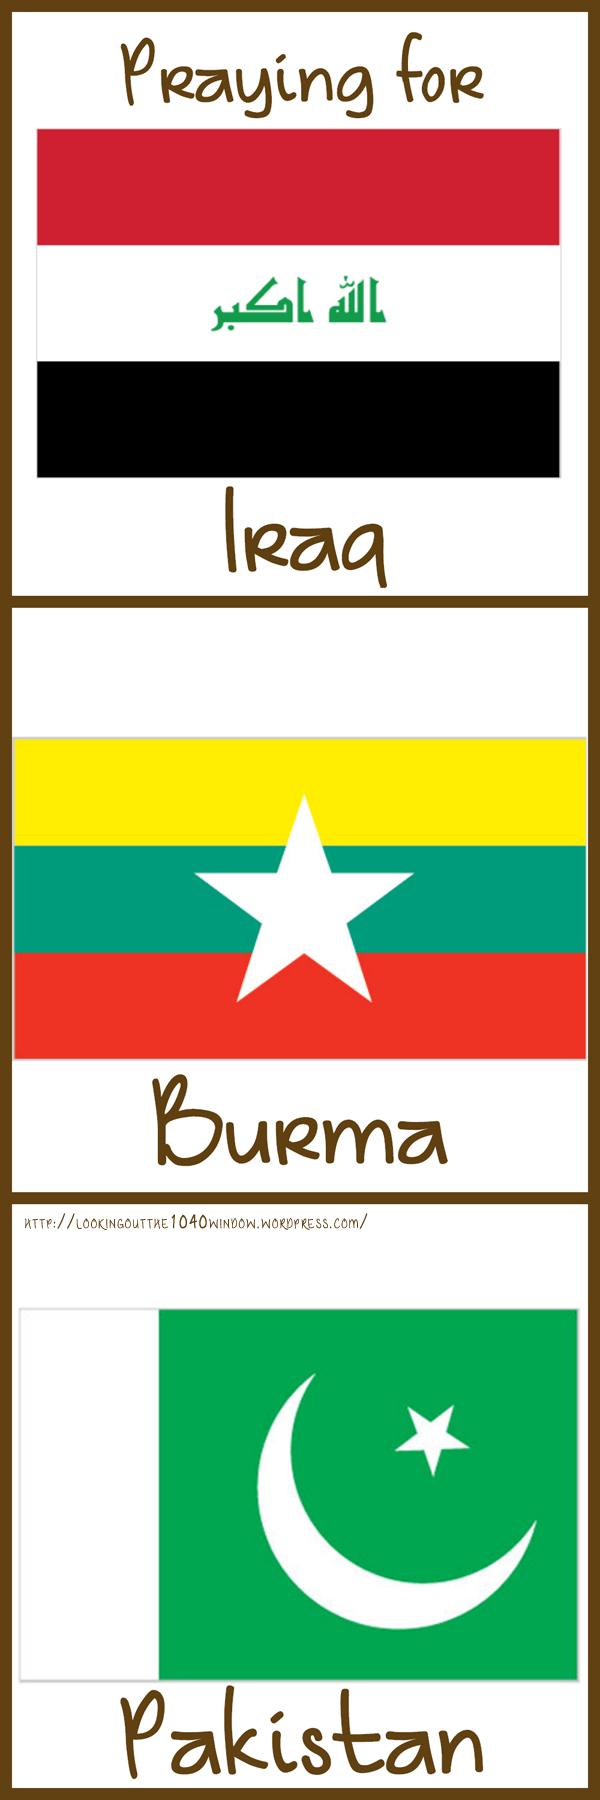 Prayer requests for Iraq, Burma, and Pakistan